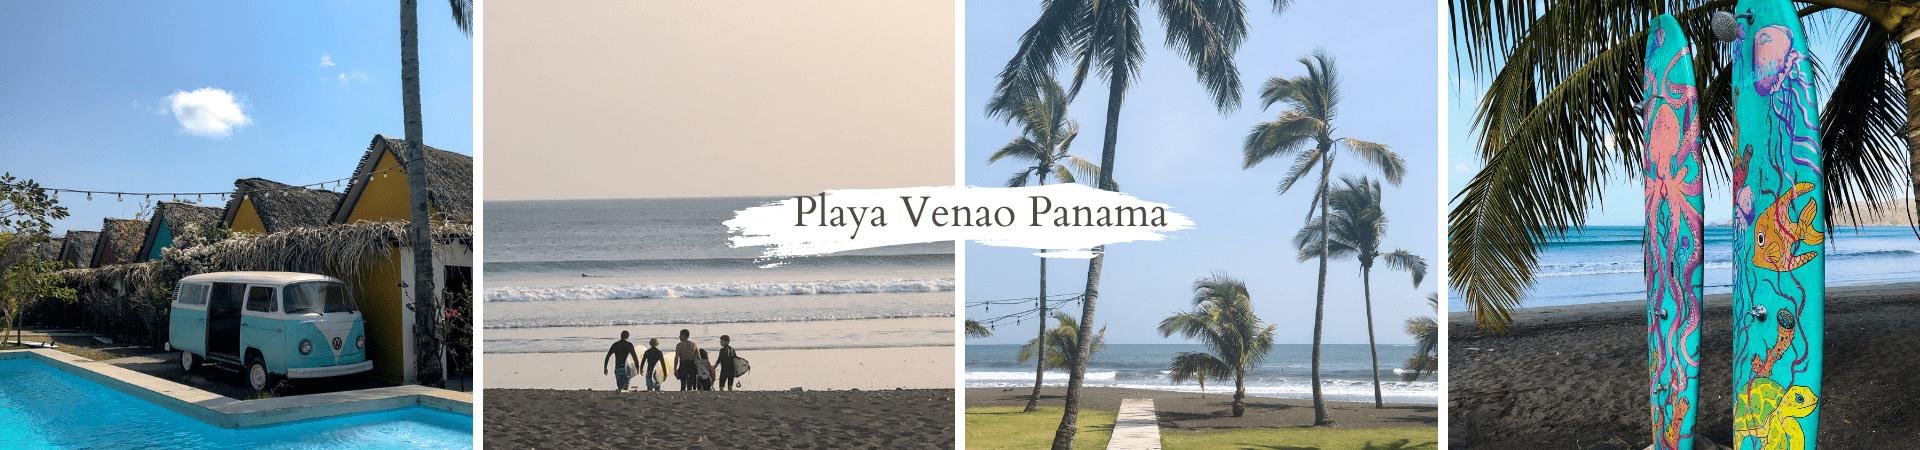 playa venao surf panama פלאיה ונאו פנמה